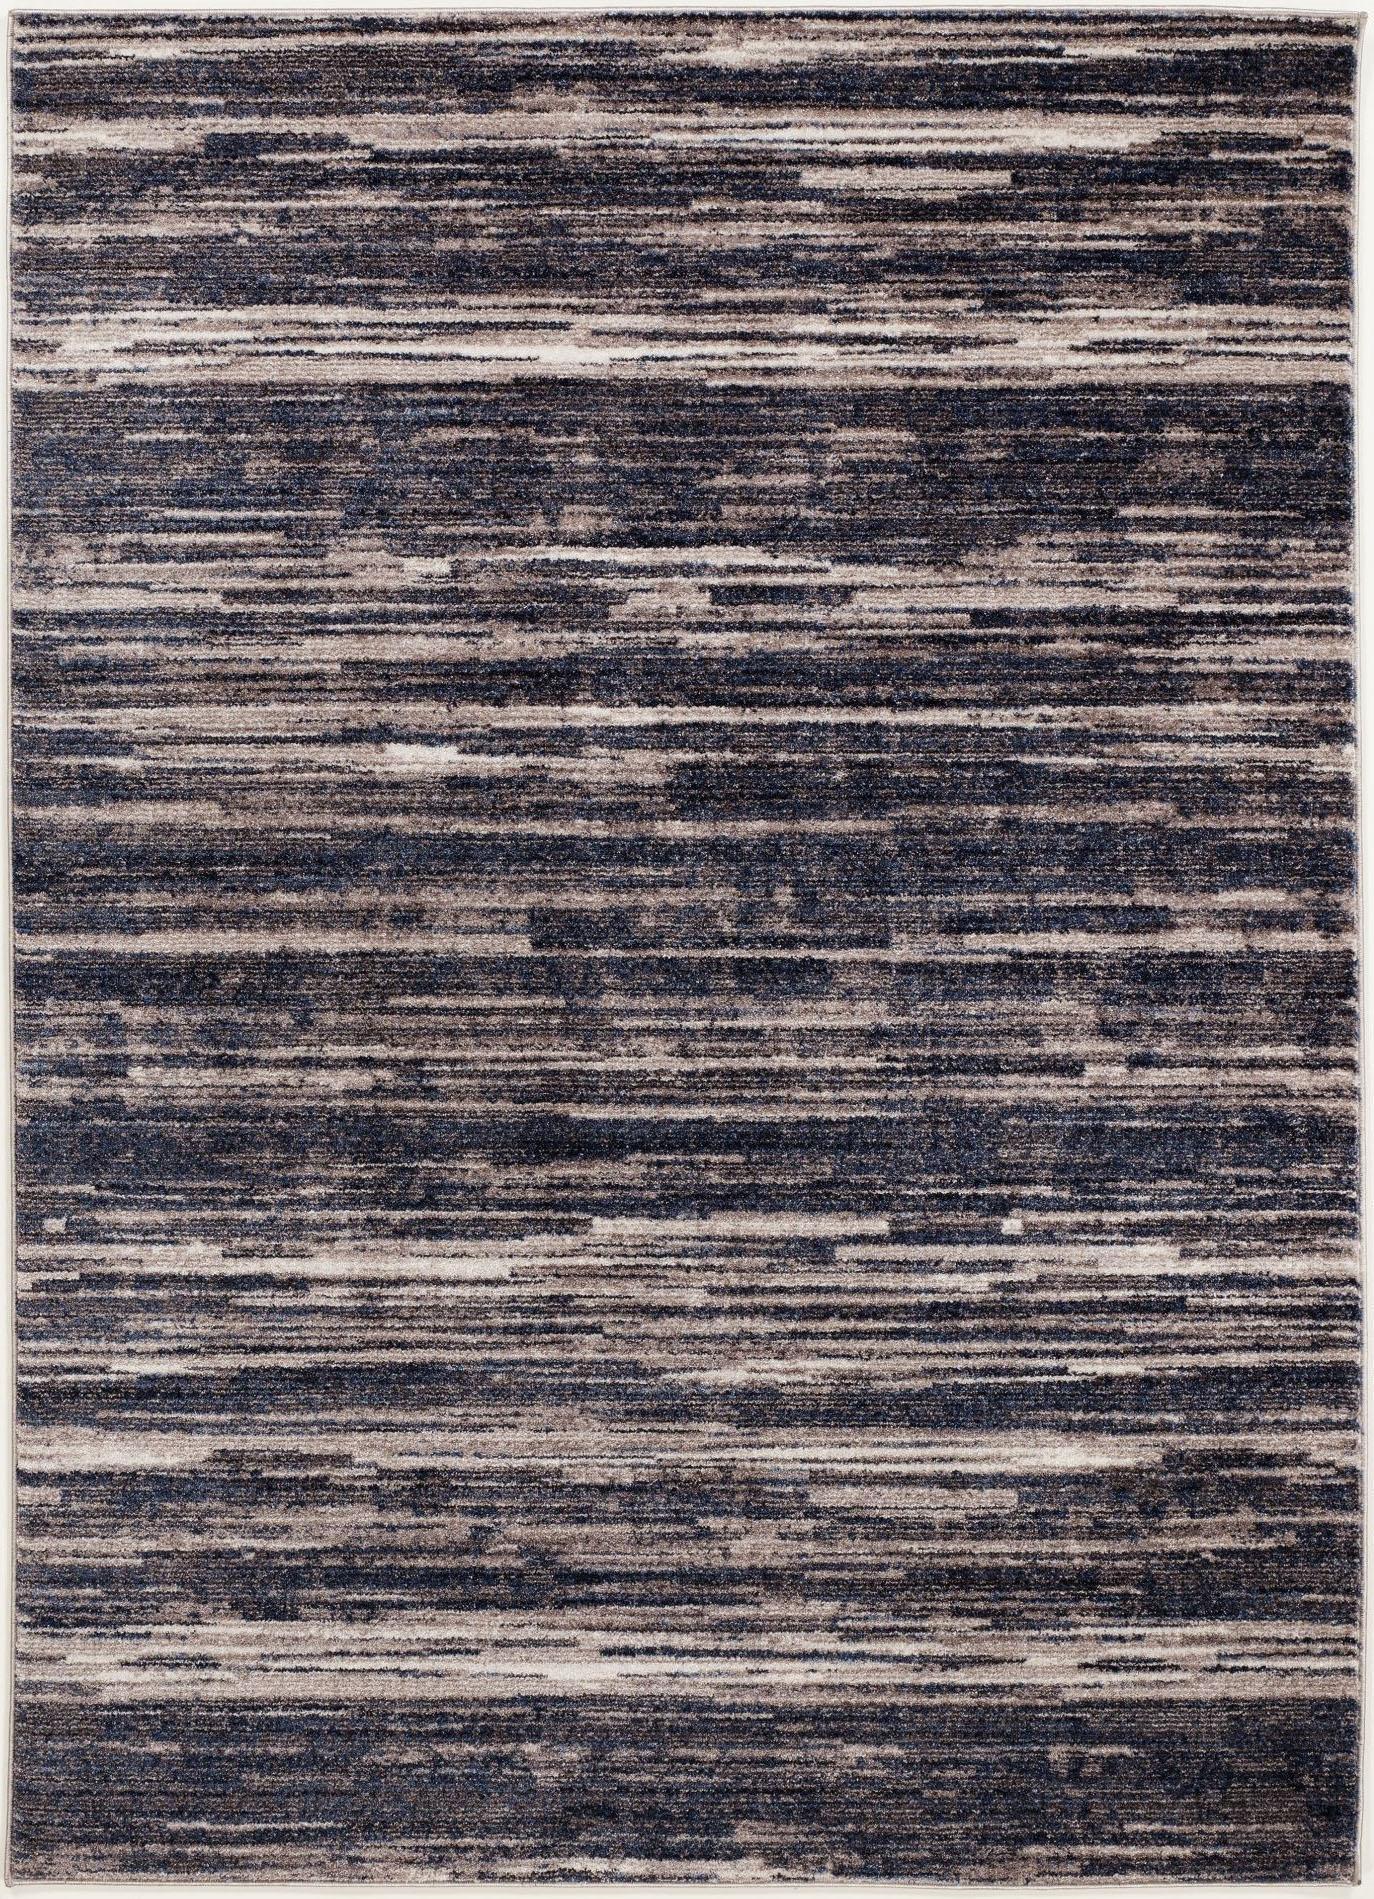 Teppich Beauty Travel OCI DIE TEPPICHMARKE rechteckig Höhe 13 mm maschinell gewebt